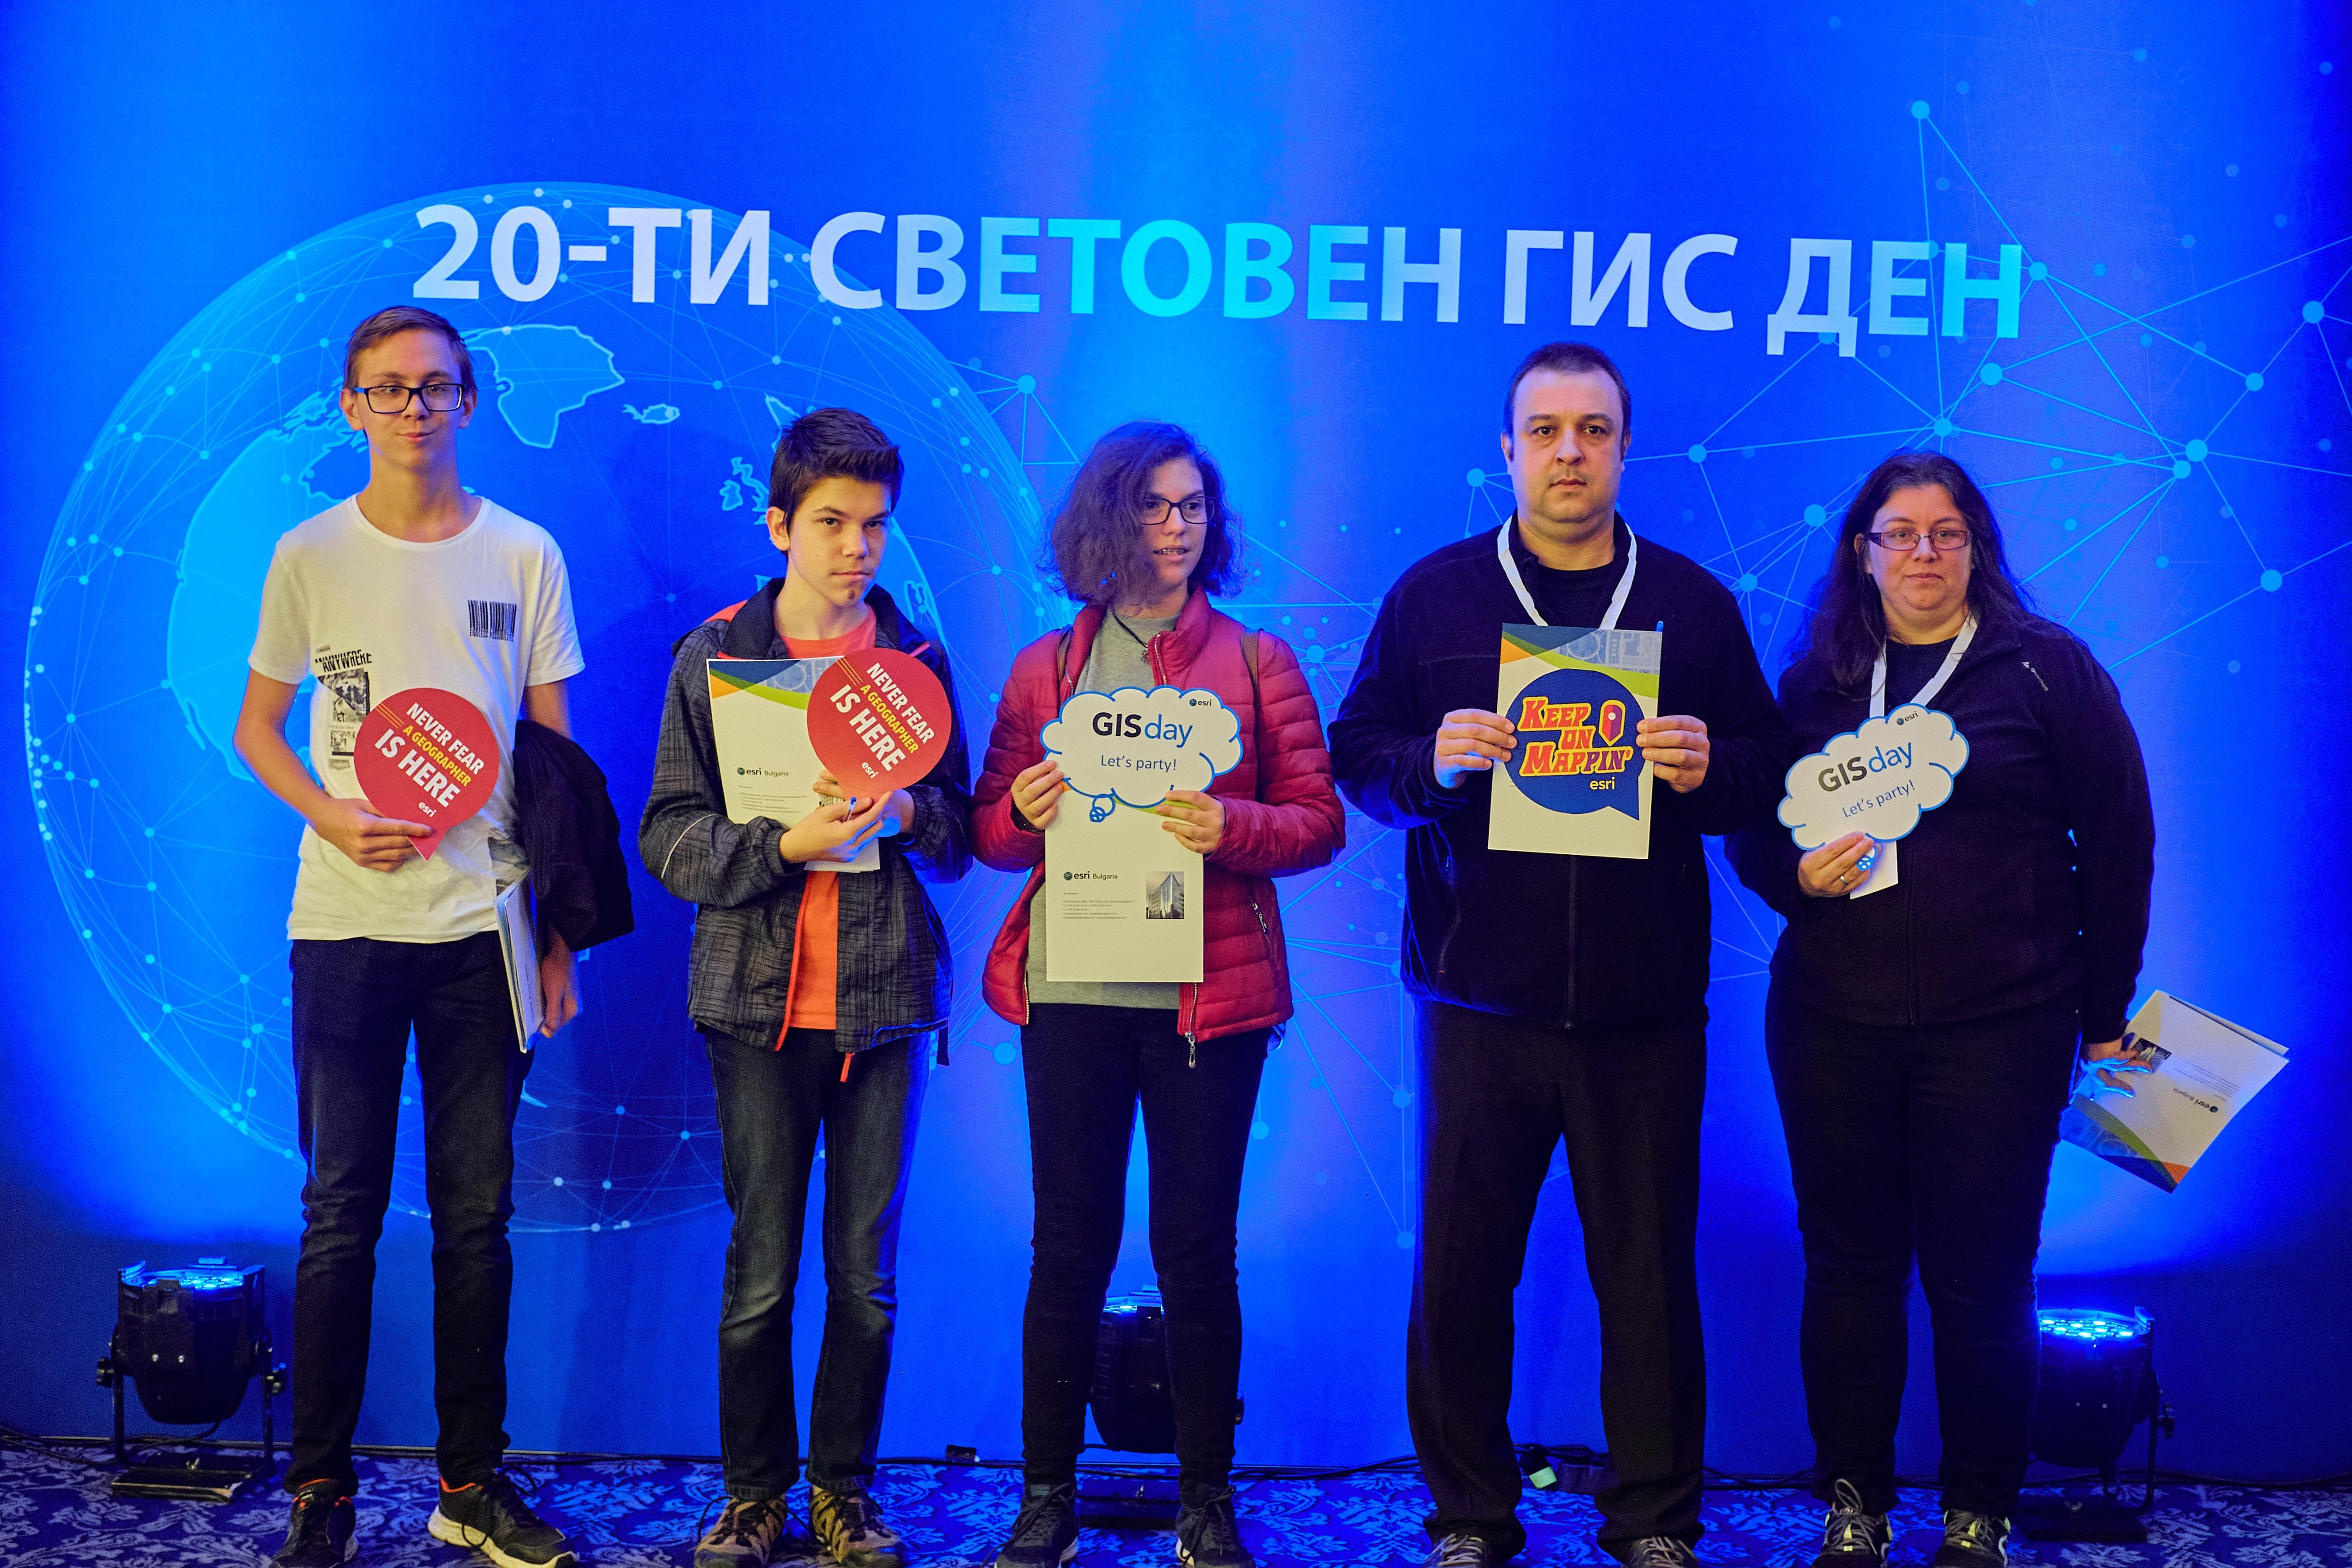 SCGIS Bulgaria - участие в 20-ти ГИС ден